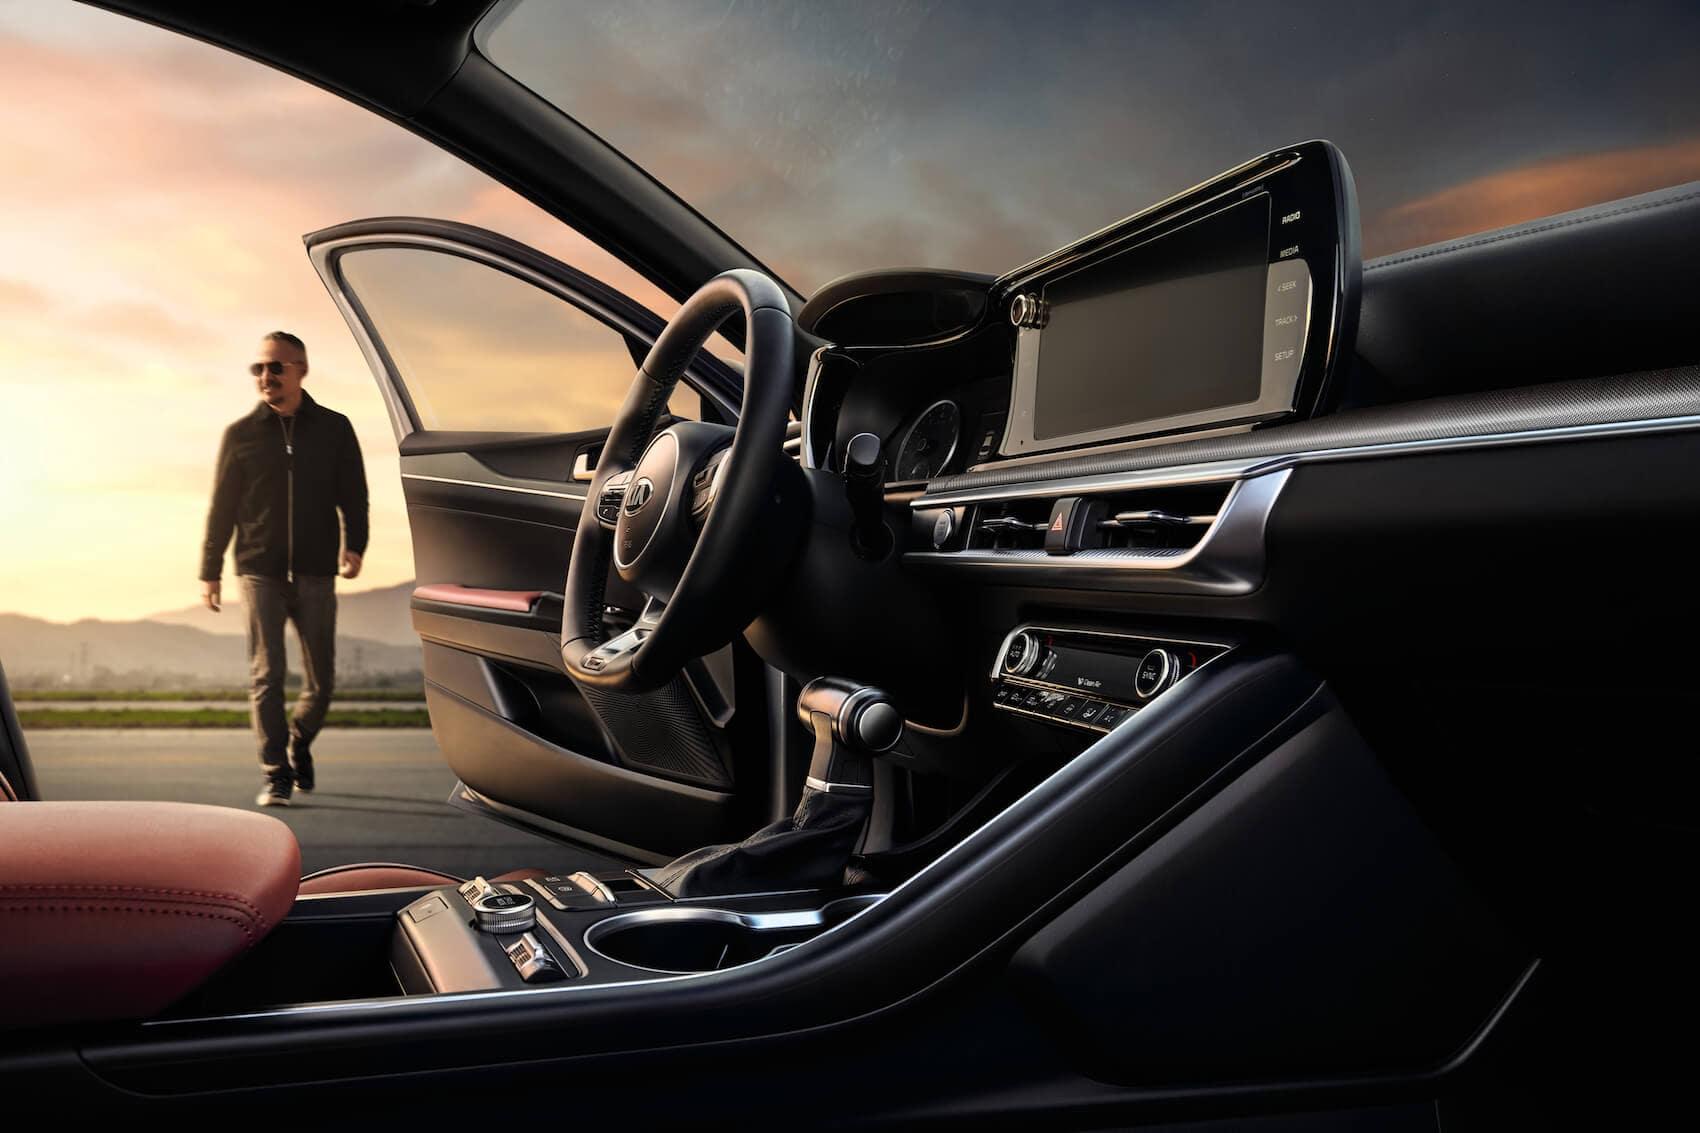 2021 Kia K5 interior Jenkintown, PA